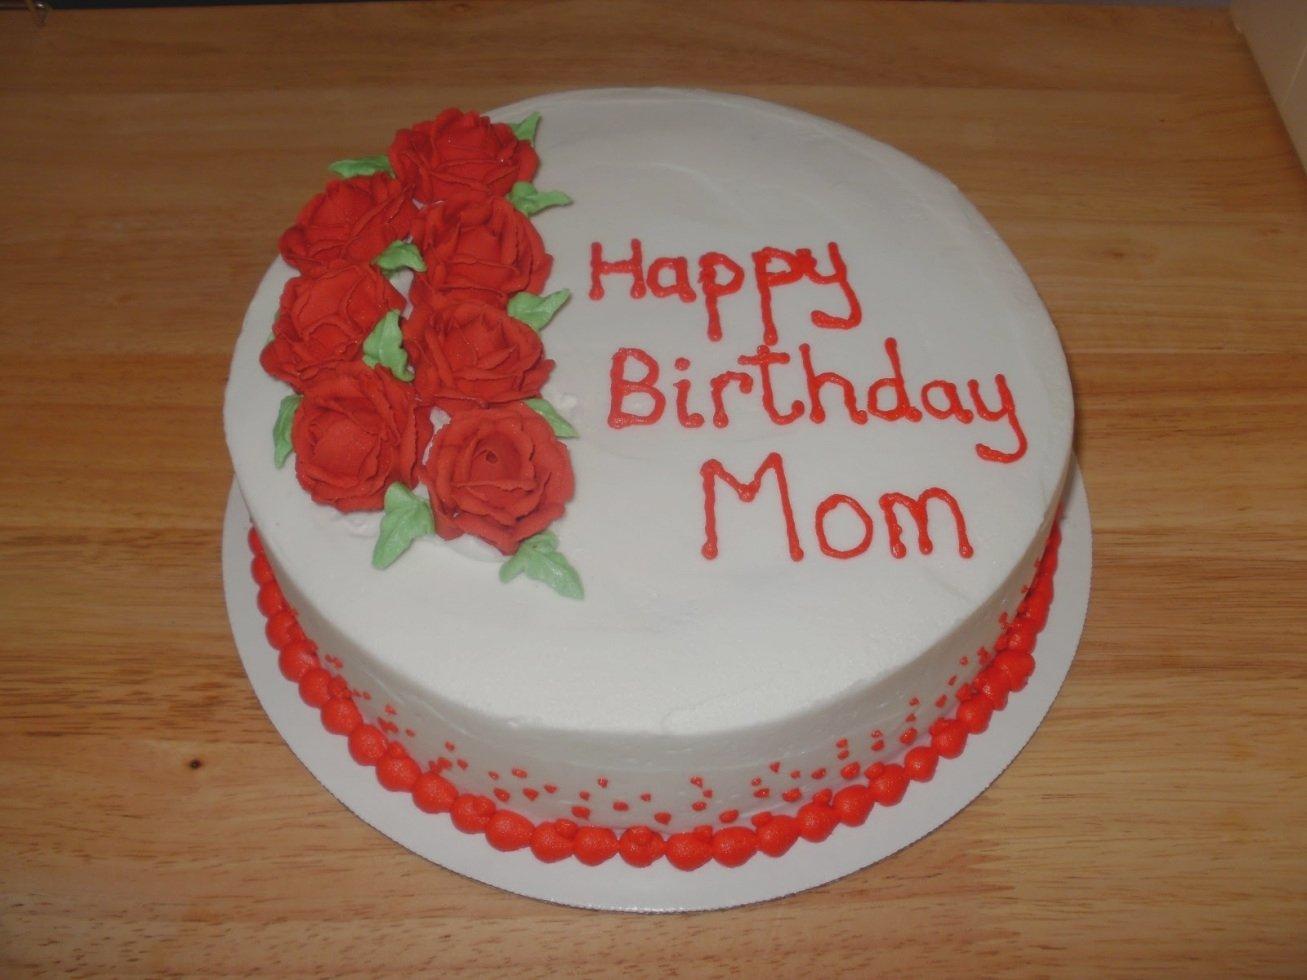 10 Fashionable Birthday Cake Ideas For Mom awesome mother birthday cake fun cakes mom pinterest 2018 birthday 2020